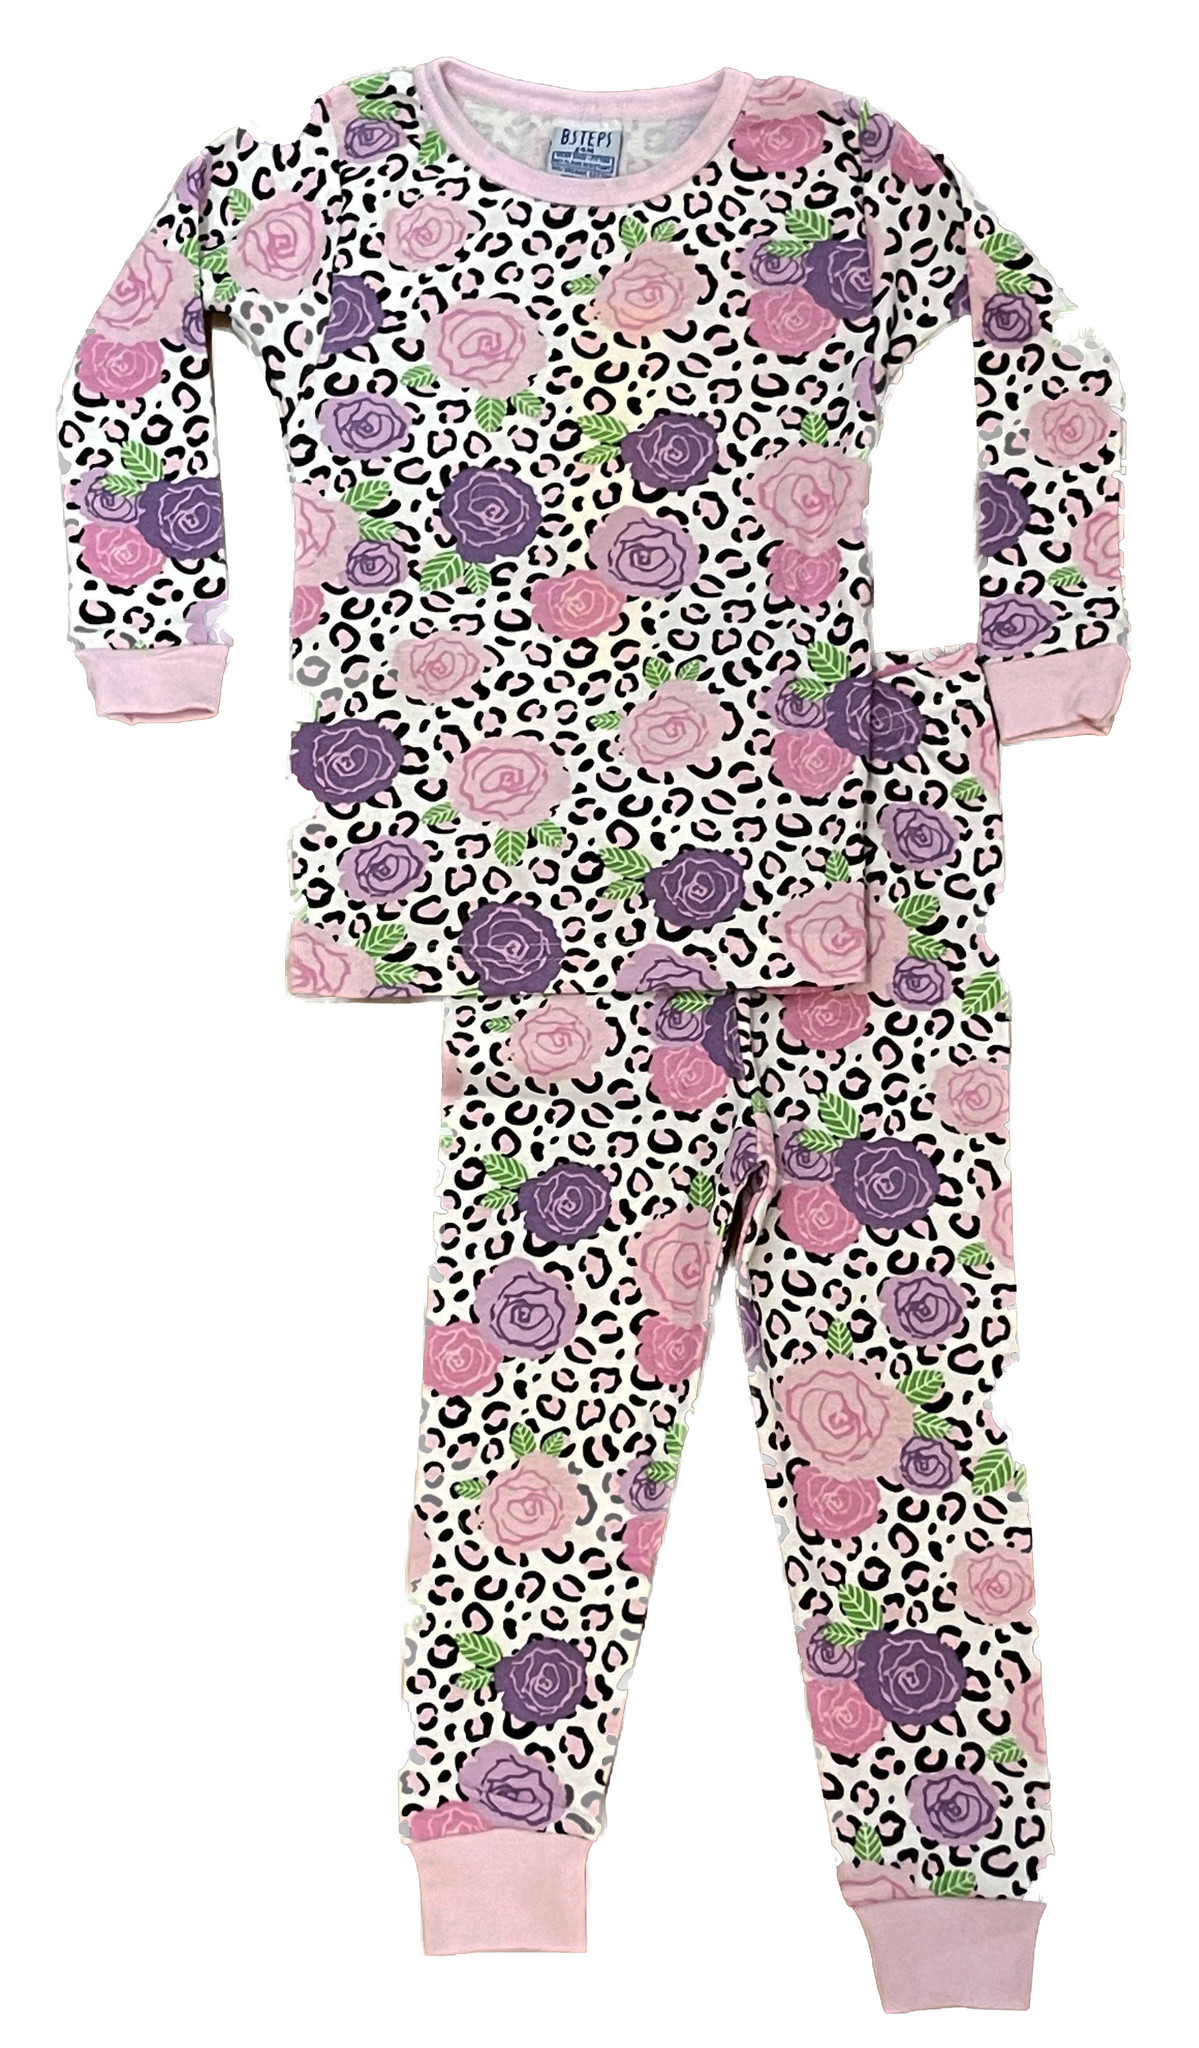 Baby Steps Wild Flower Infant PJ Set